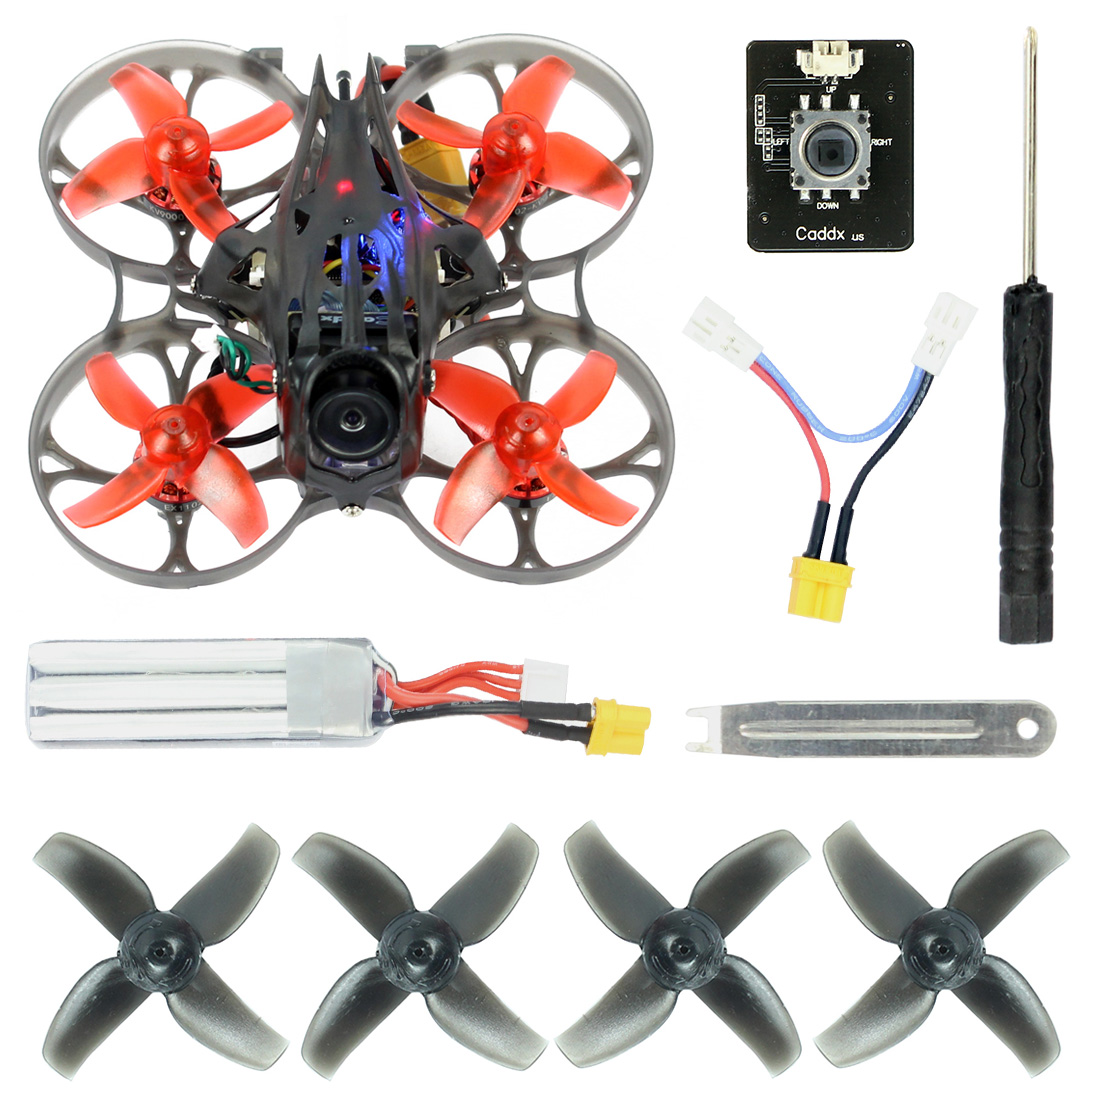 Mise à niveau Happymodel Mobula7 HD 2-3 S 75mm crazy ybee F4 Pro Bwhoop FPV Drone de course PNP BNF avec CADDX tortue V2 HD Mini caméra